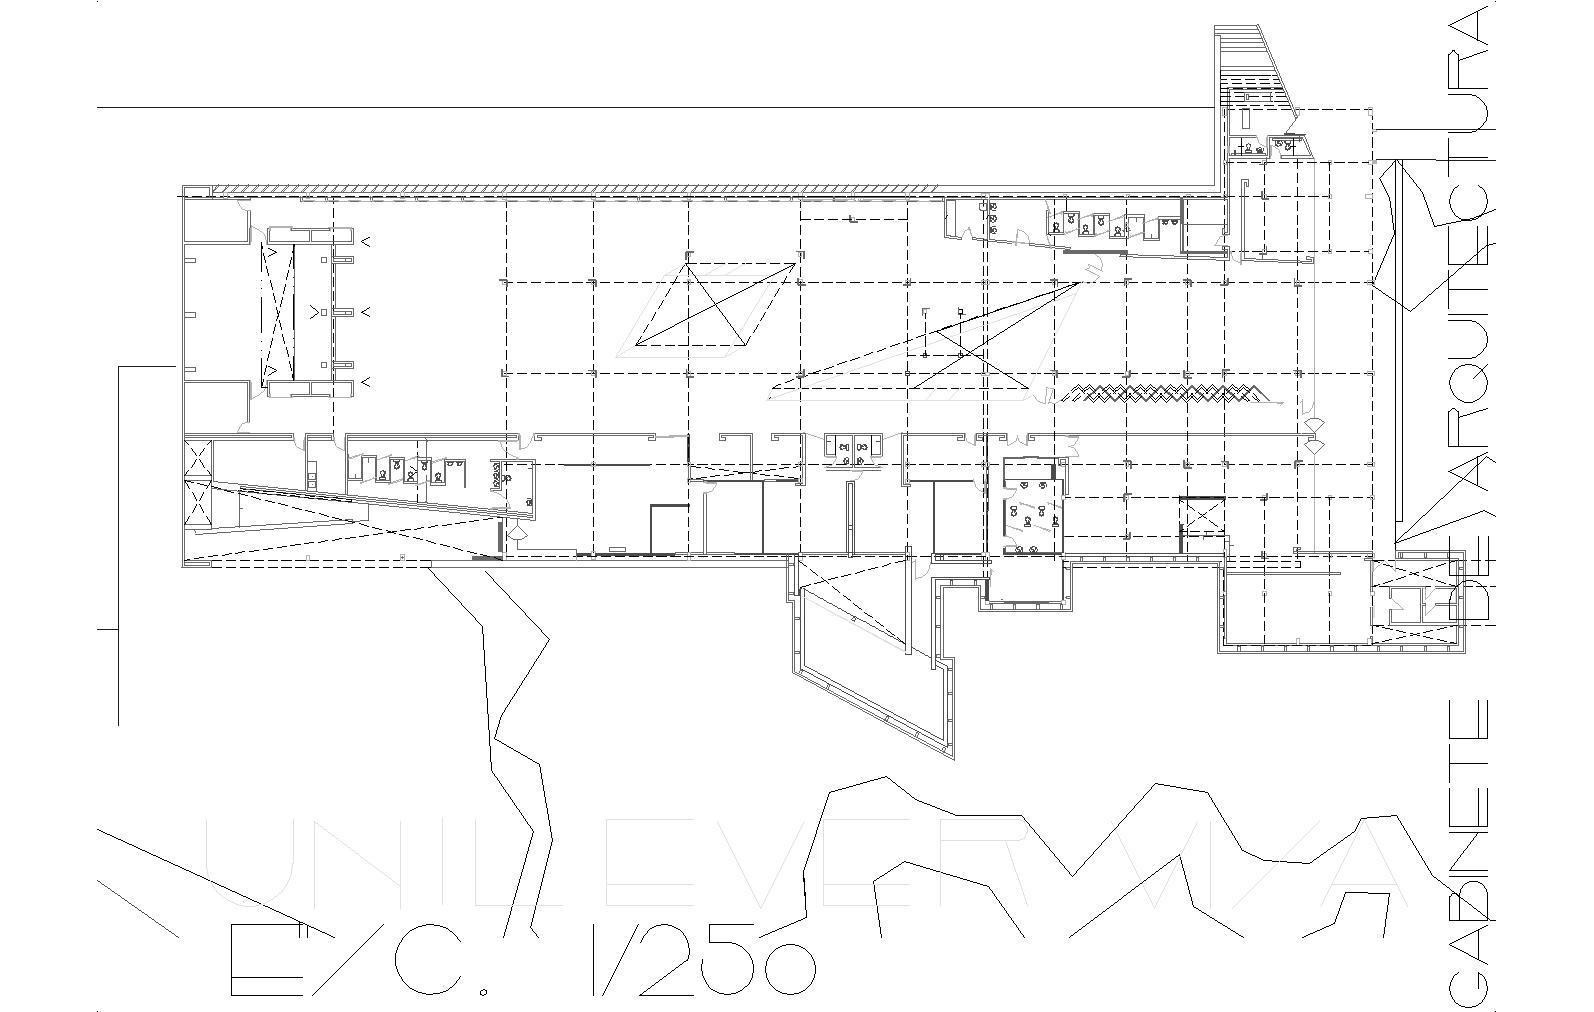 1307389954-planta-sector-administrativo-model.jpg